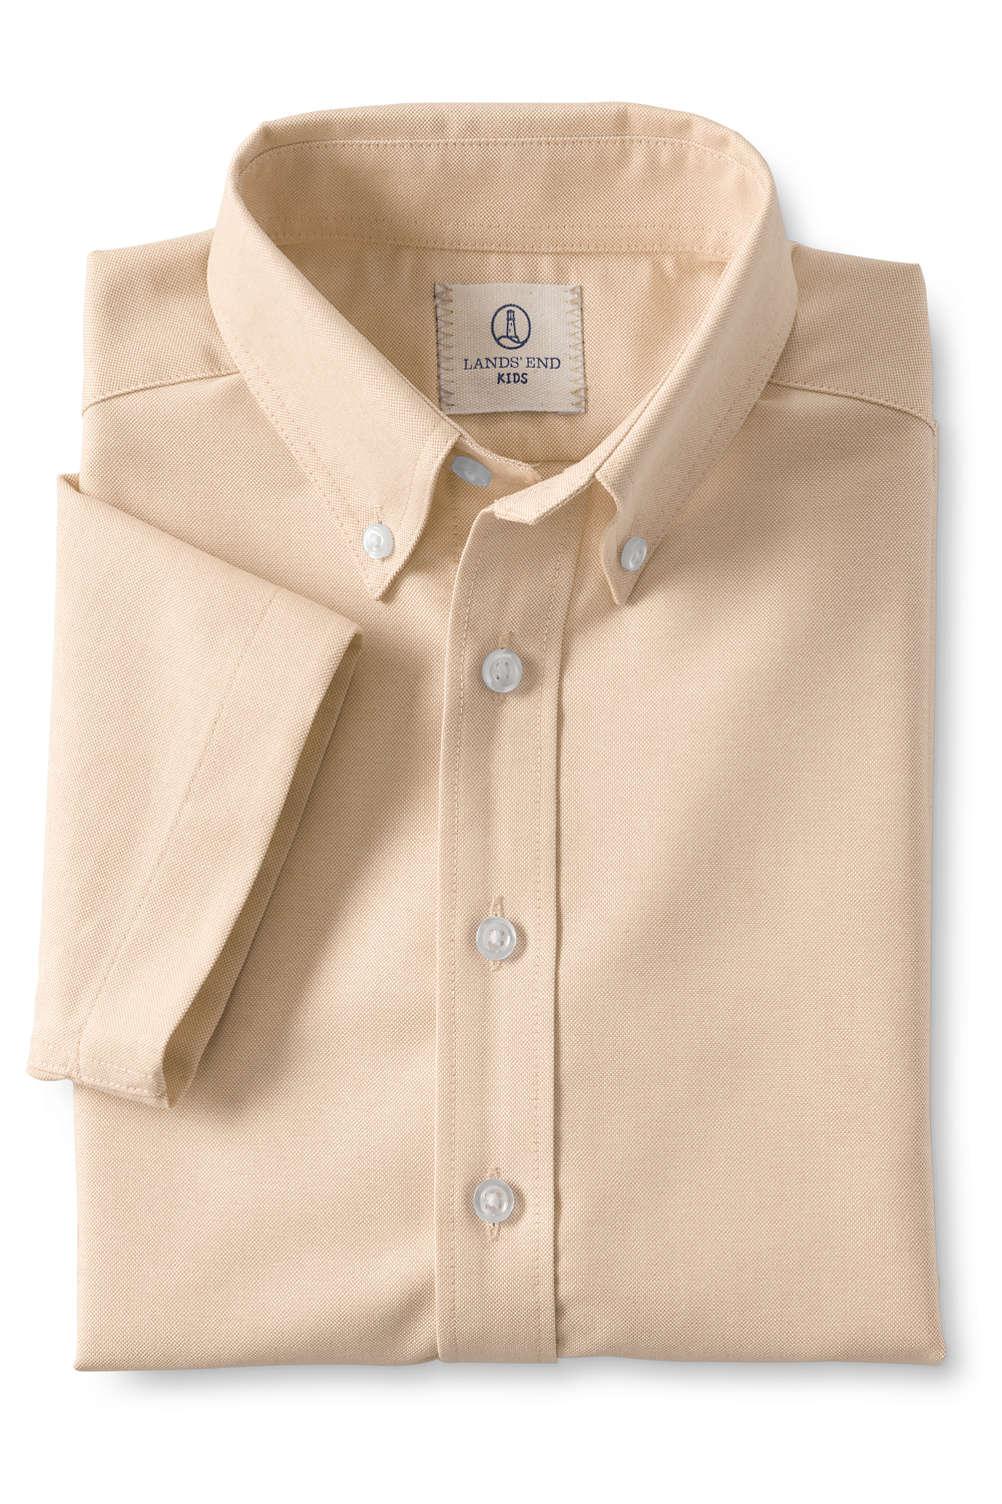 5ae97642b304 School Uniform Boys Short Sleeve Oxford Shirt from Lands  End